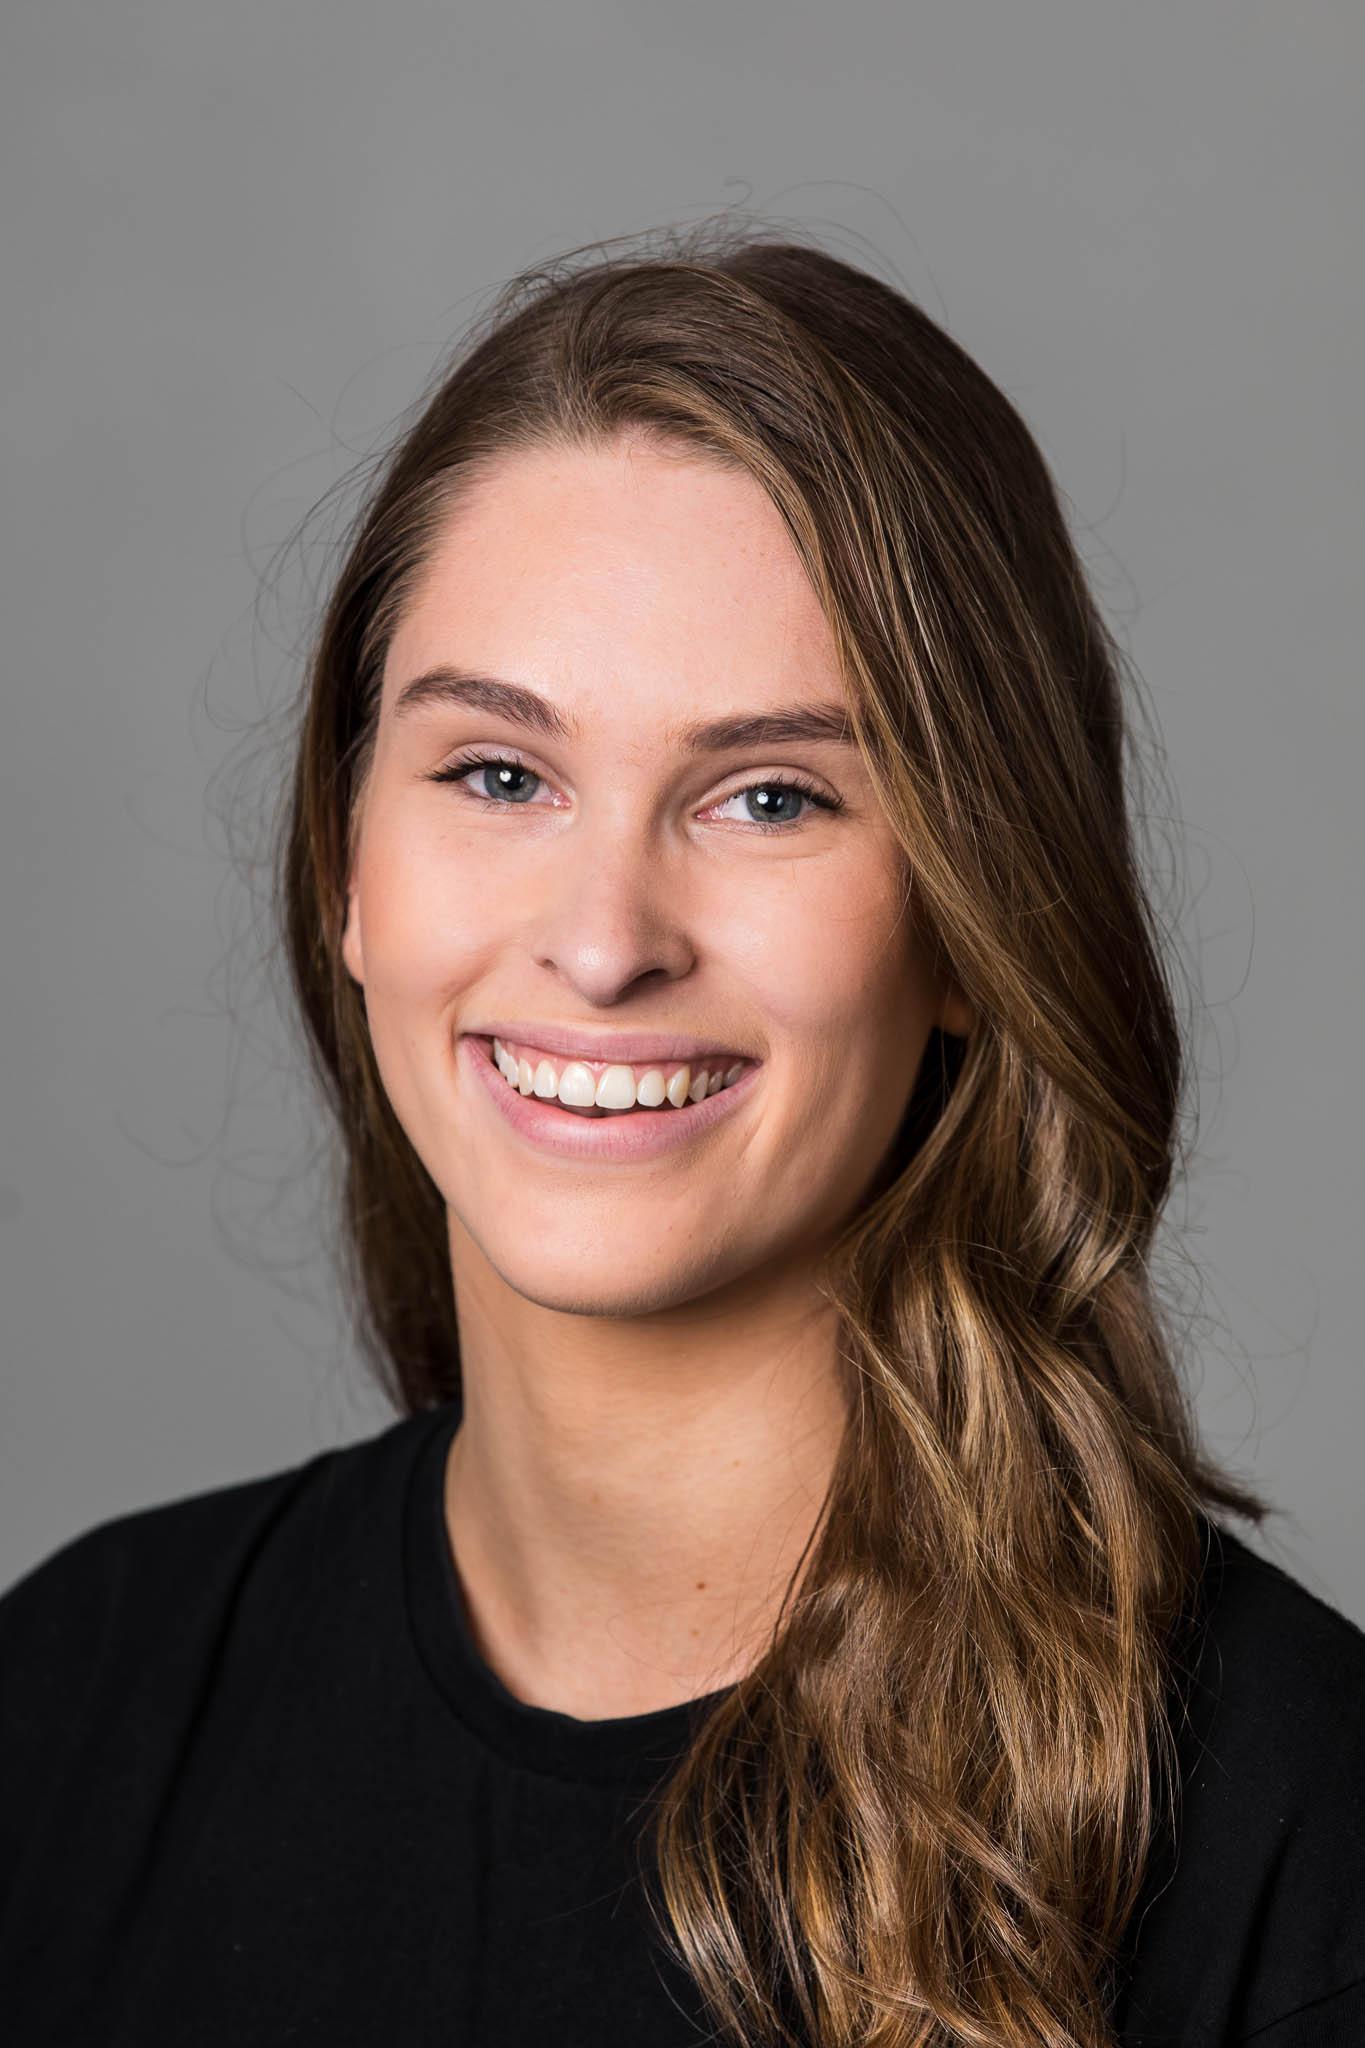 Olivia Staniforth